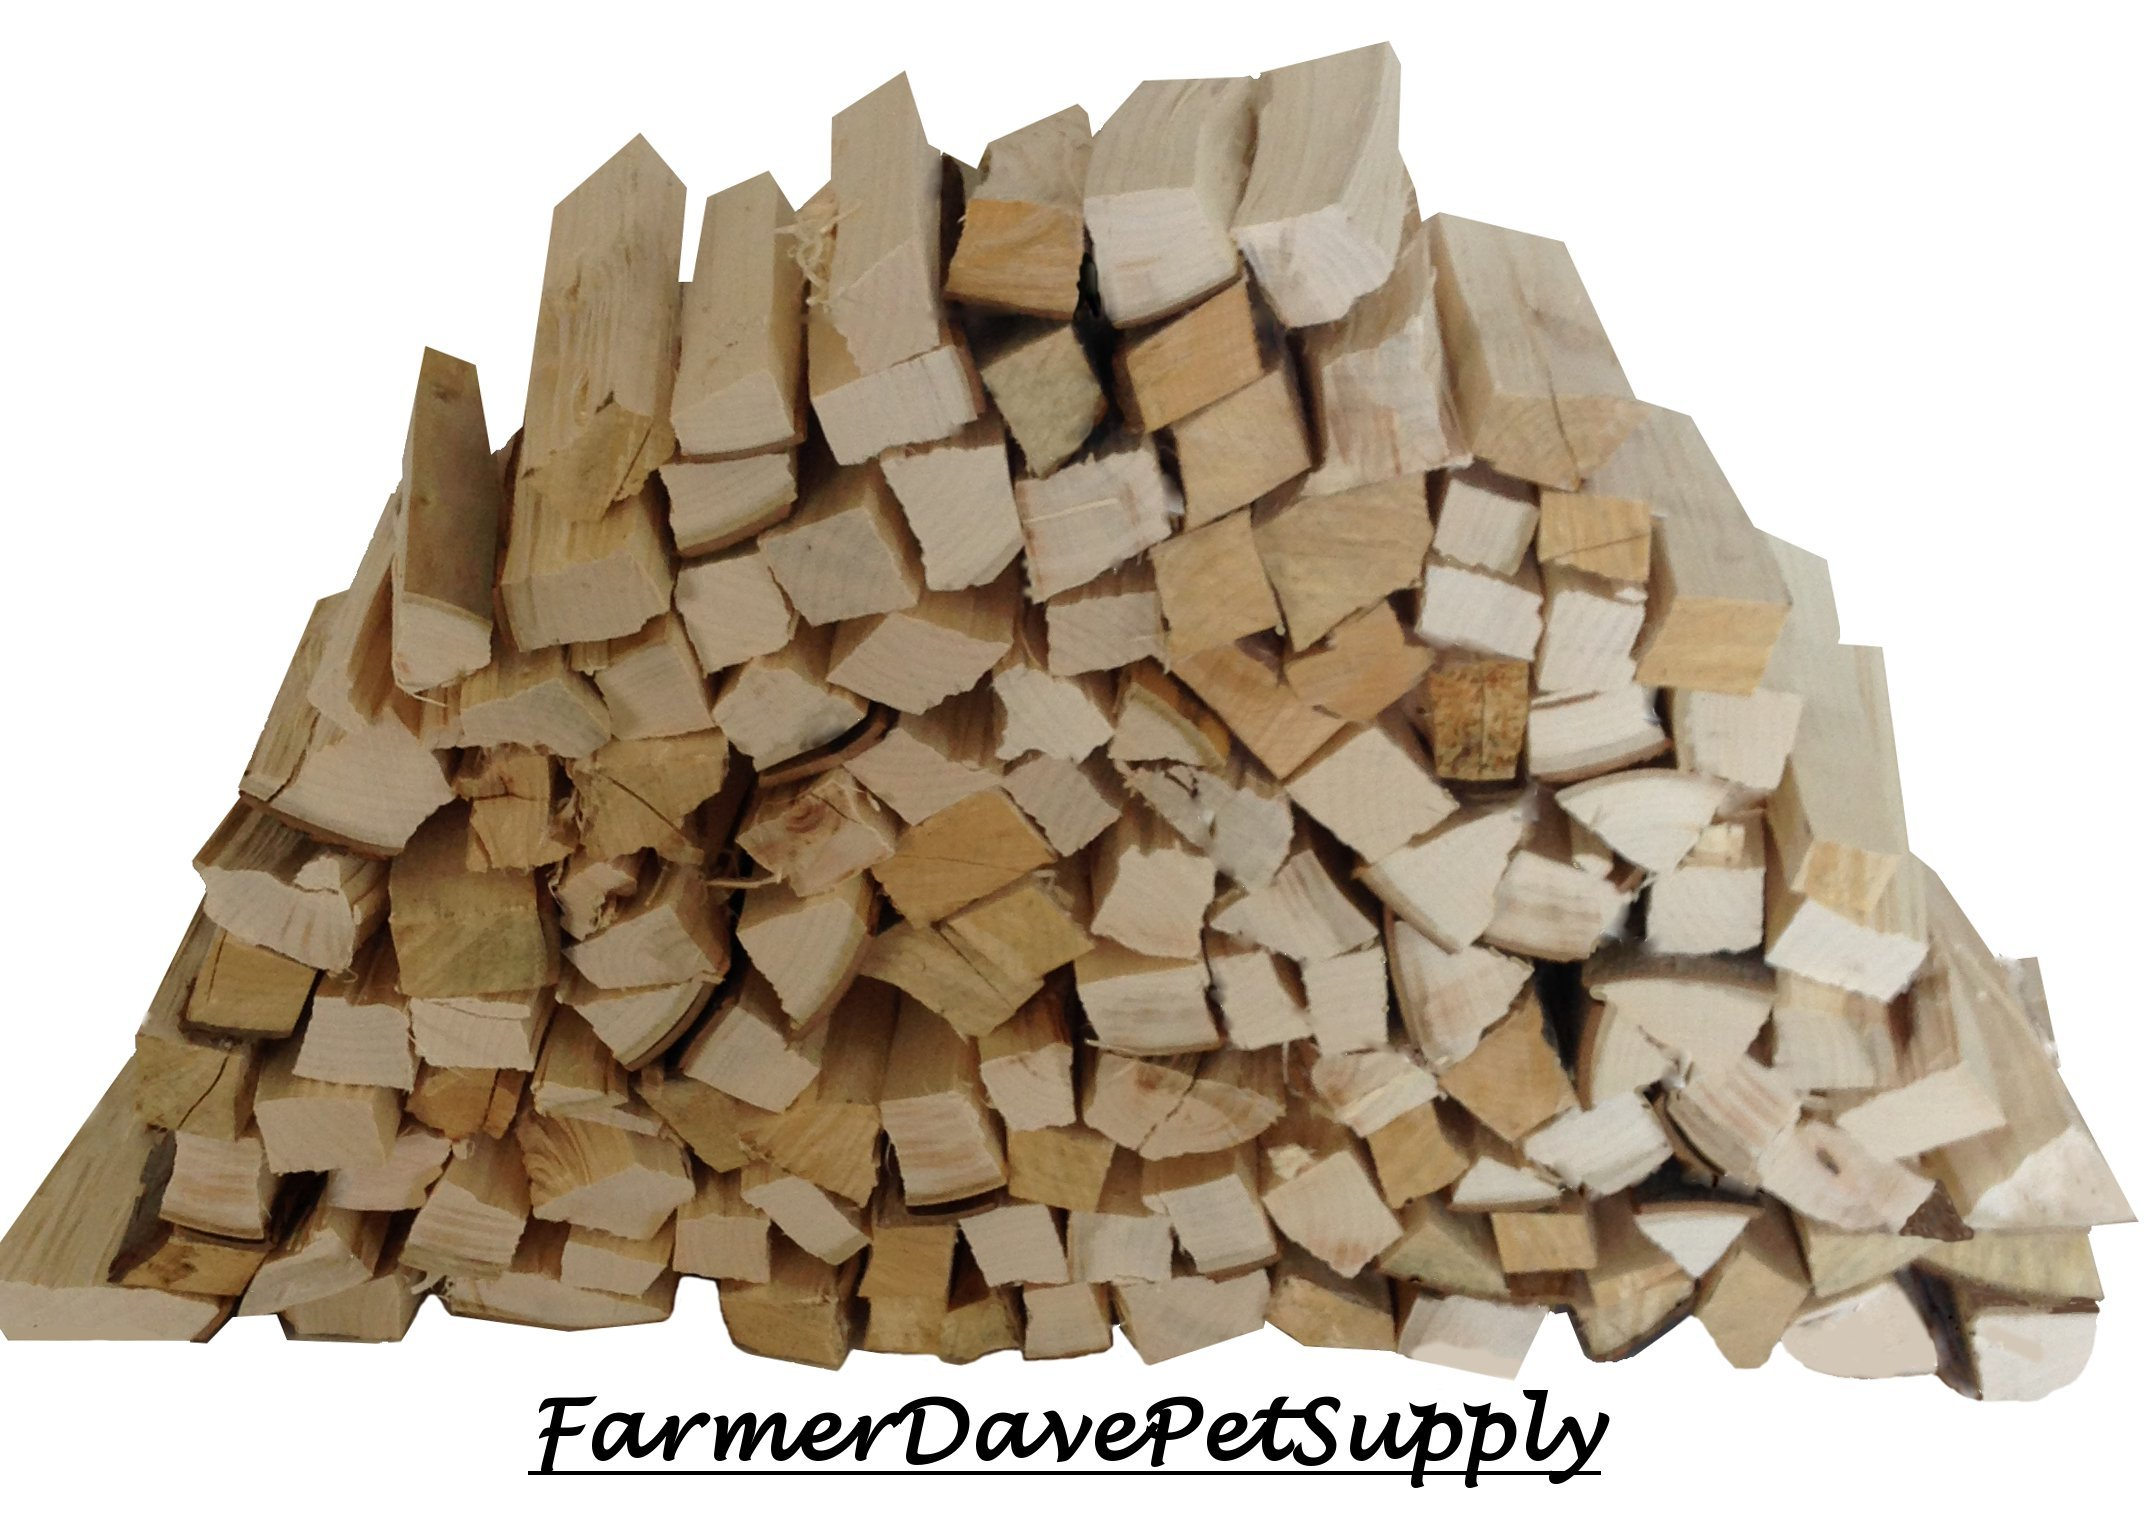 FarmerDavePetSupply 1200 Cubic Inch SUGAR MAPLE WOOD BBQ GRILLING SMOKER STICKS